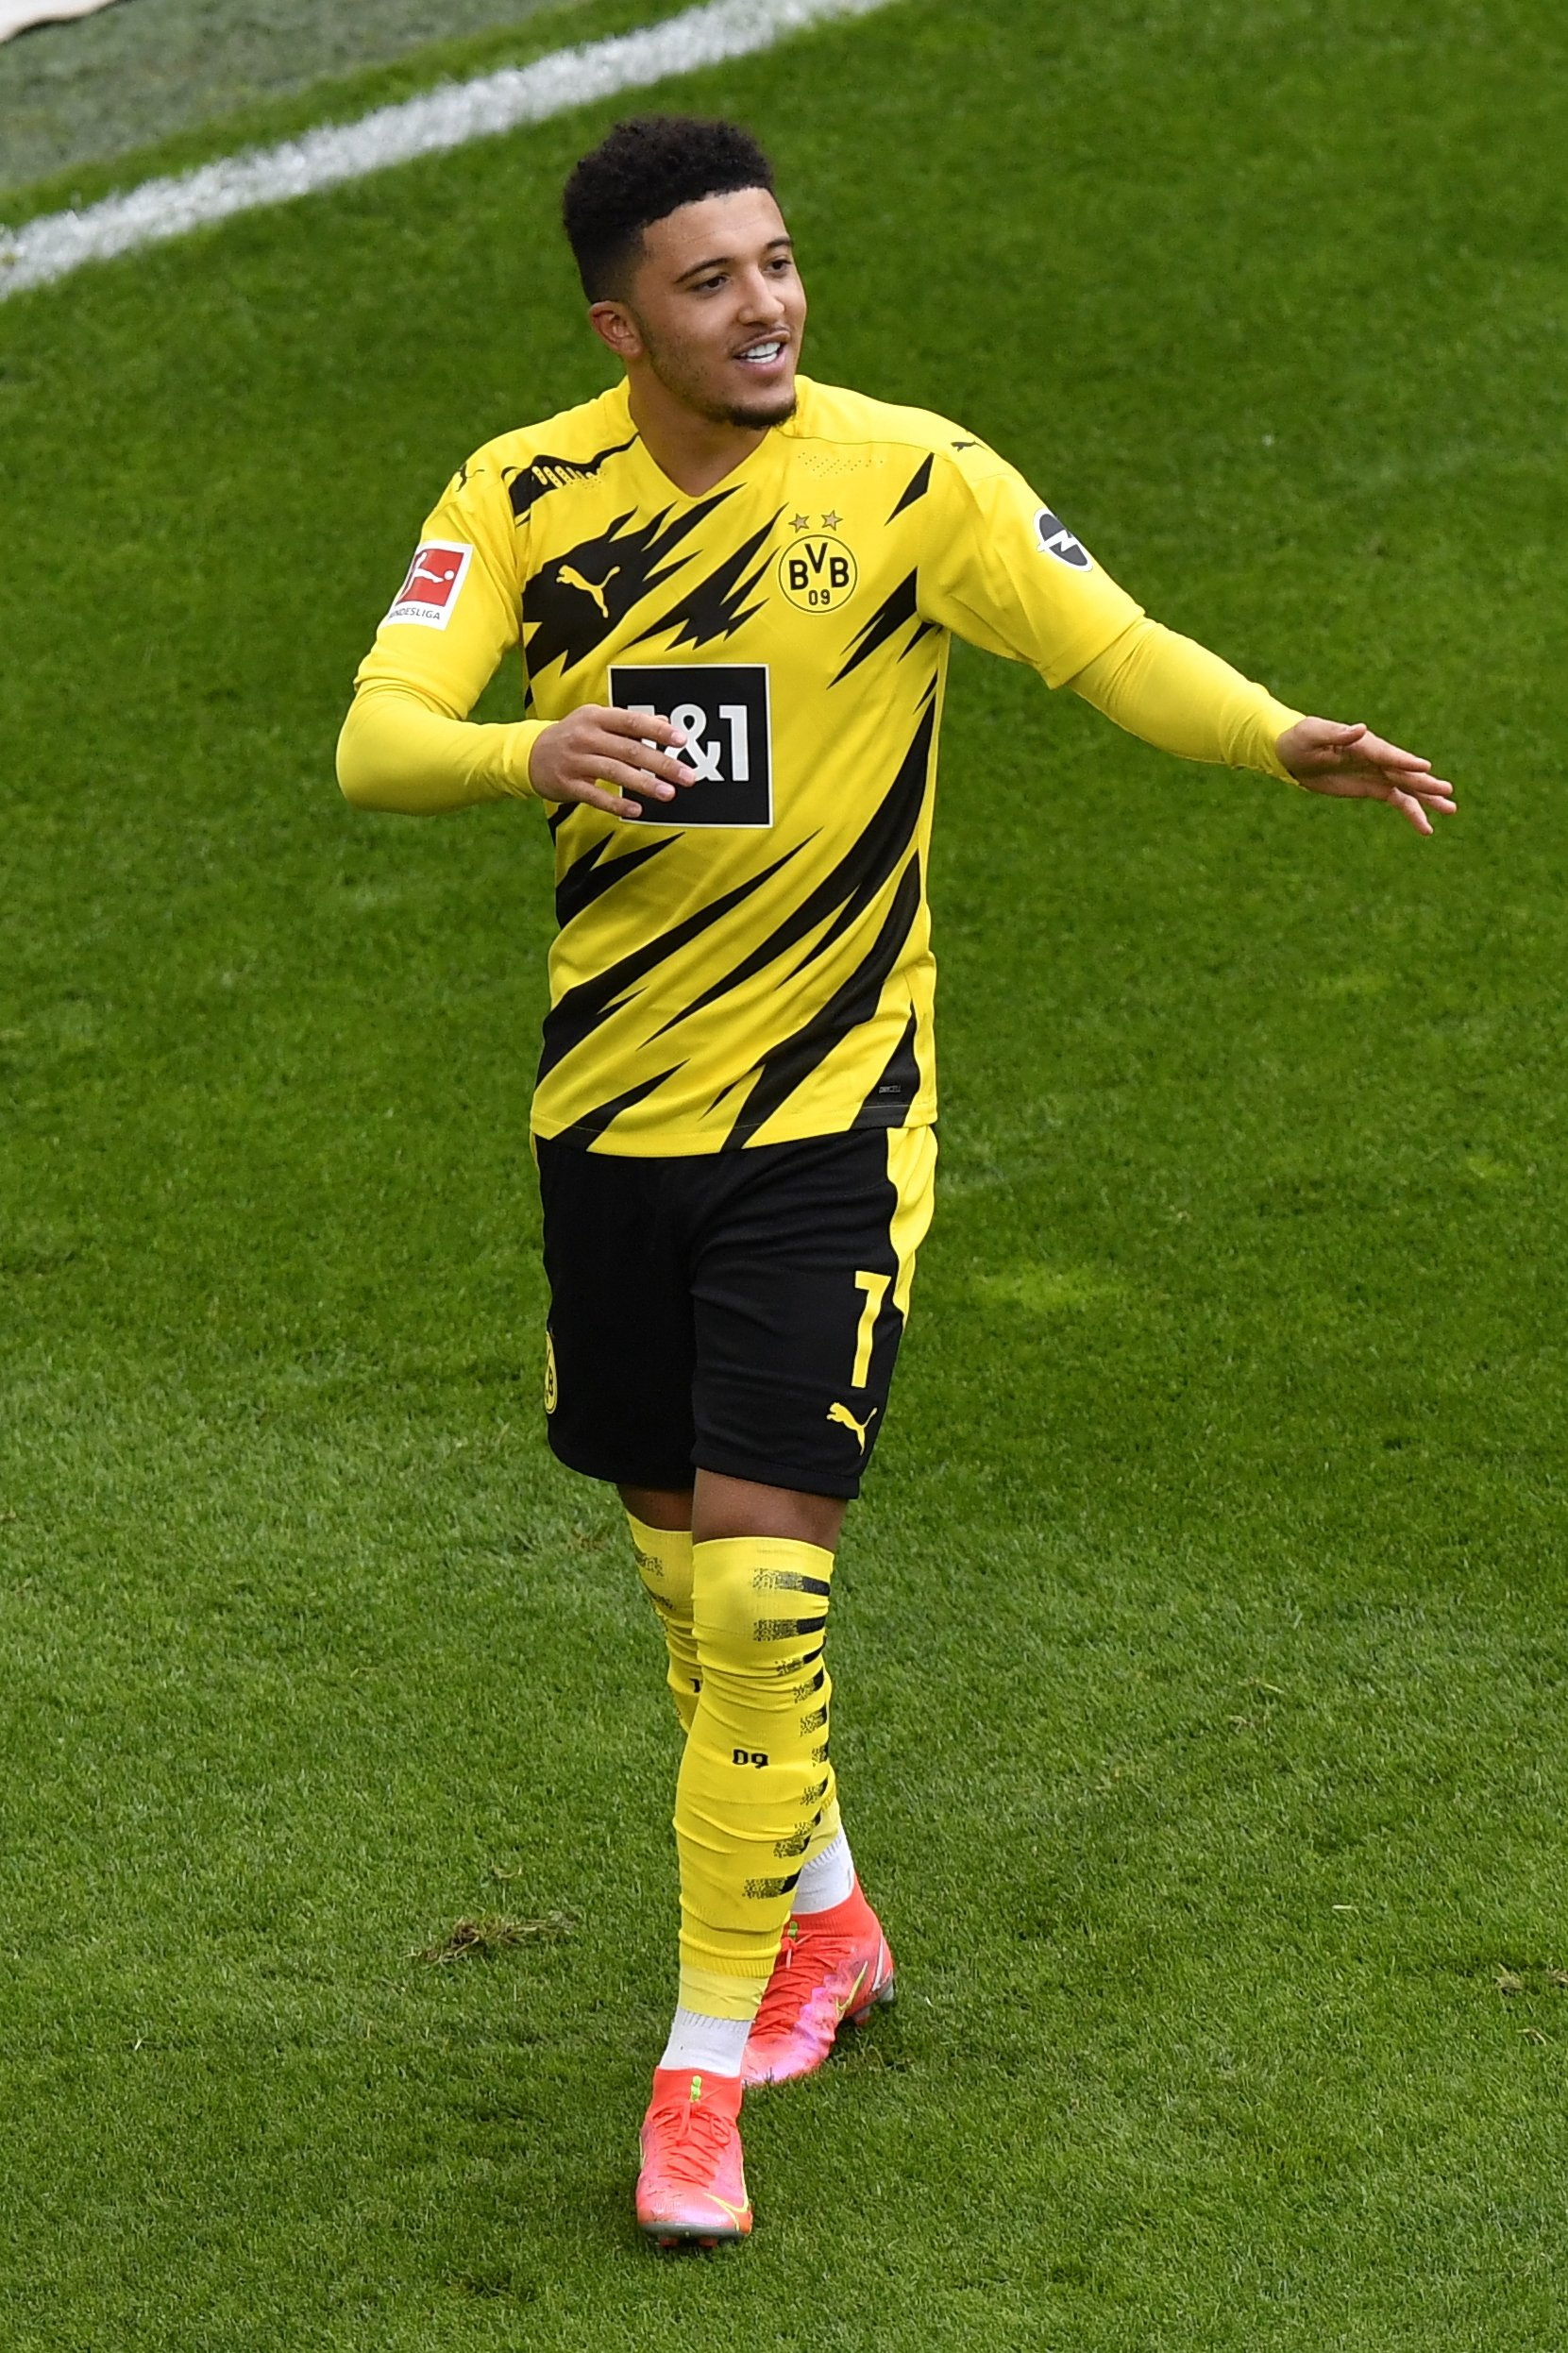 Dortmund's Jadon Sancho celebrates after scoring his side's second goal during a Bundesliga match against RB Leipzig in Dortmund, Germany, May 8, 2021. (AP Photo)